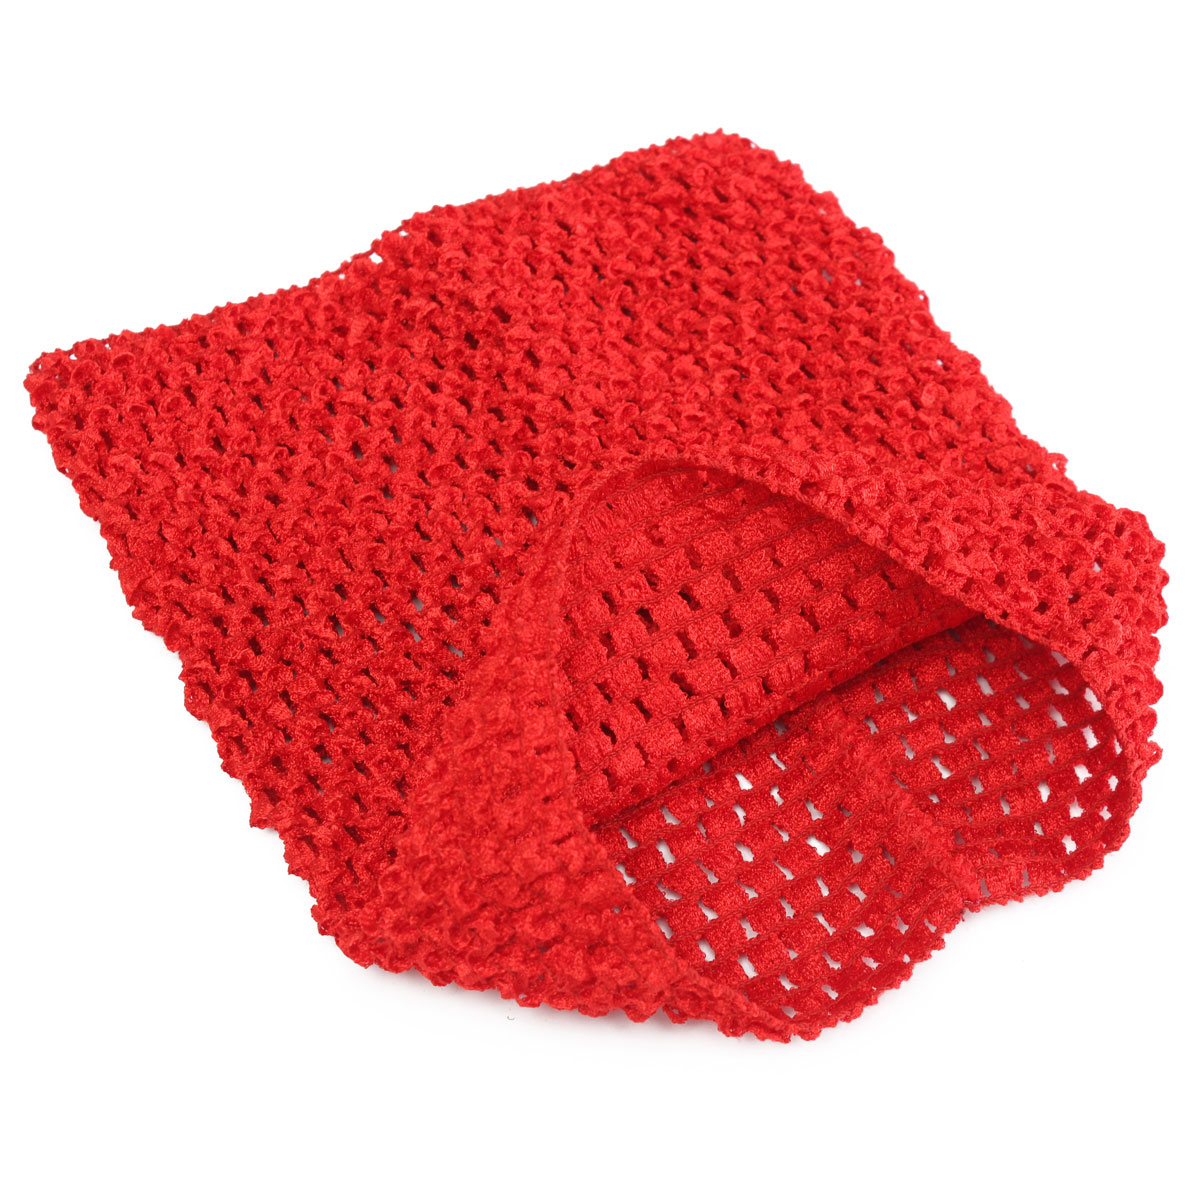 Crochet Tube Top elastic Waistband Red   Lazada Indonesia